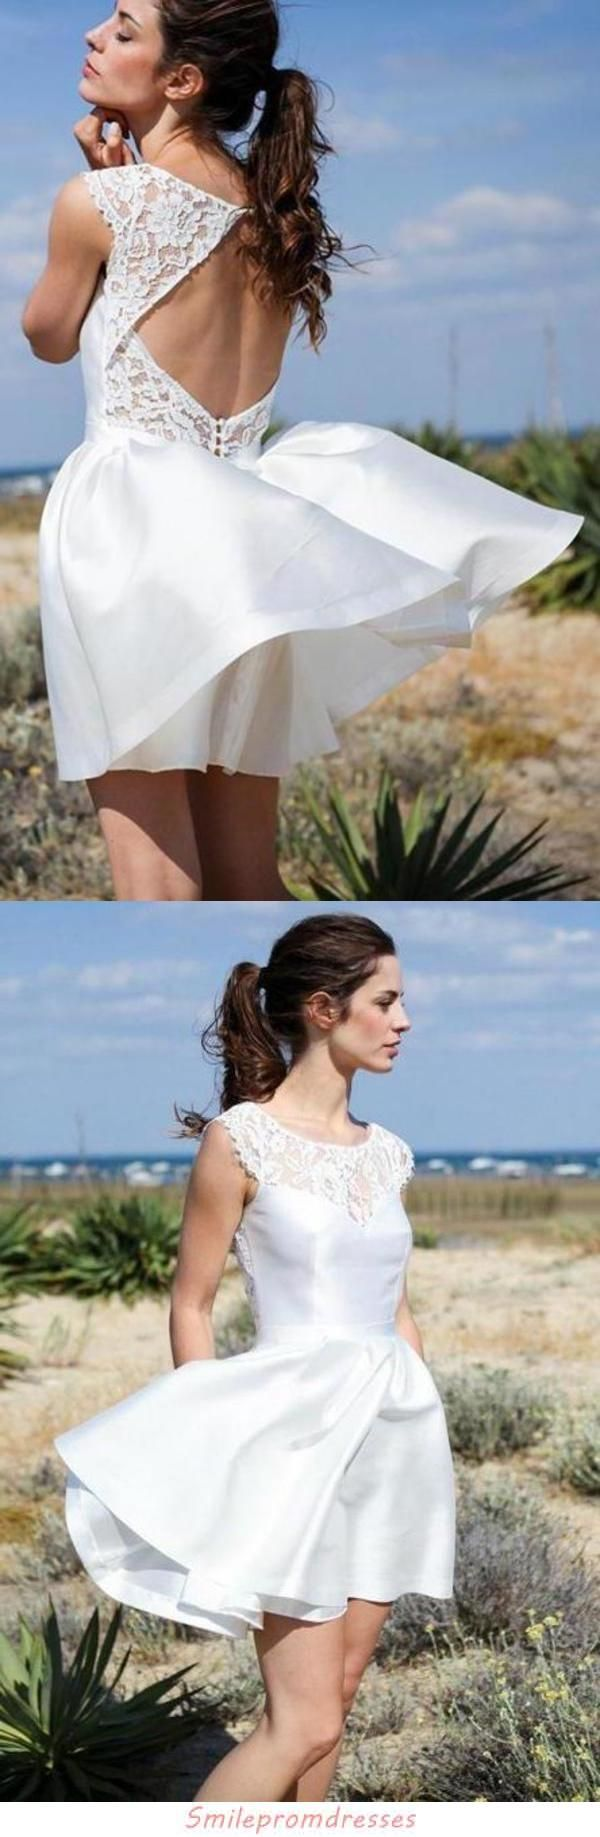 A Line Round Neck Open Back Short Beach Wedding Dress With Lace Pockets Sme15018 Short Wedding Dress Beach Backless Wedding Dress Lace Sweetheart Wedding Dress [ 1837 x 600 Pixel ]